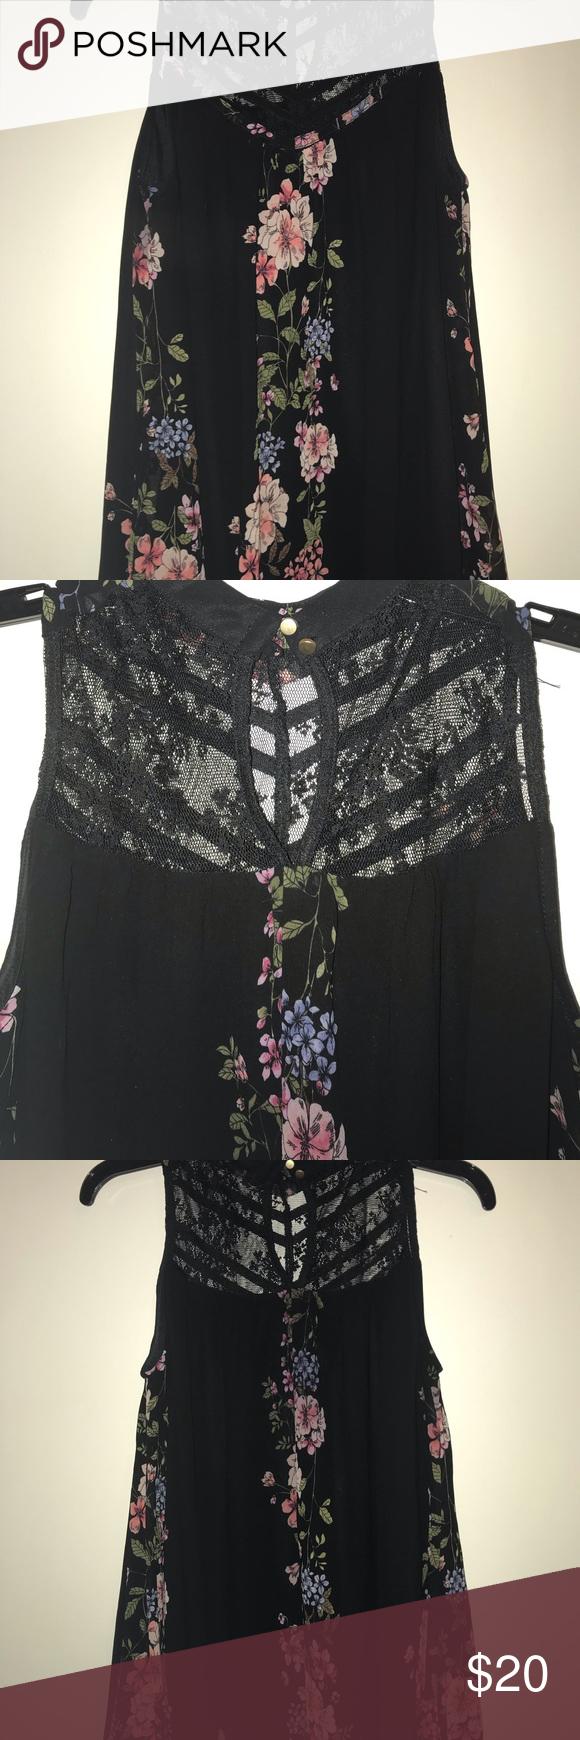 Black Dress With Flowers Black Flower Dress Flower Dresses Dresses [ 1740 x 580 Pixel ]